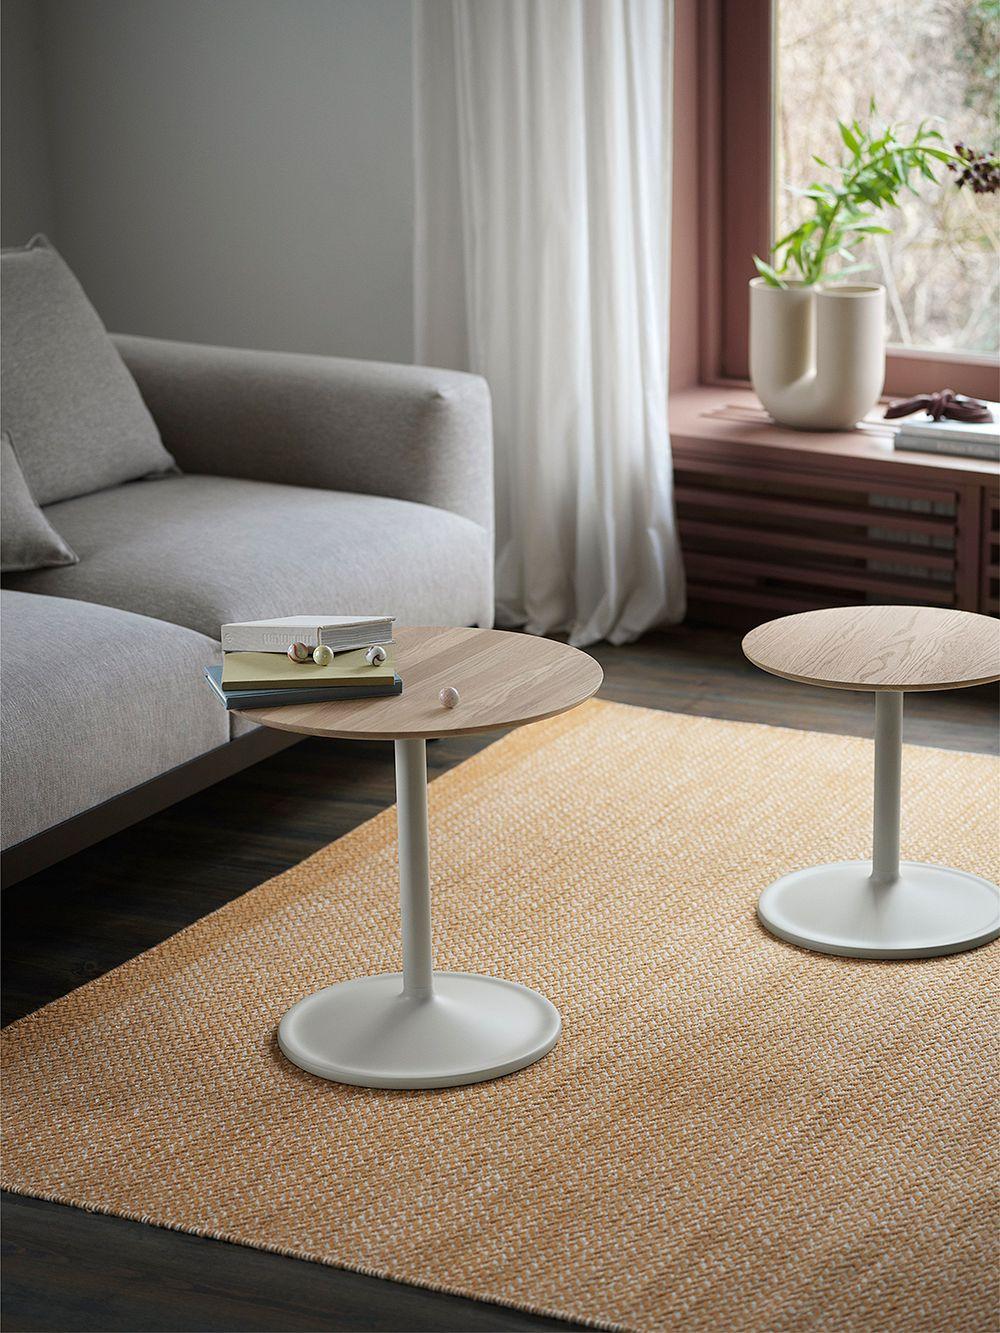 Muuto Soft side table